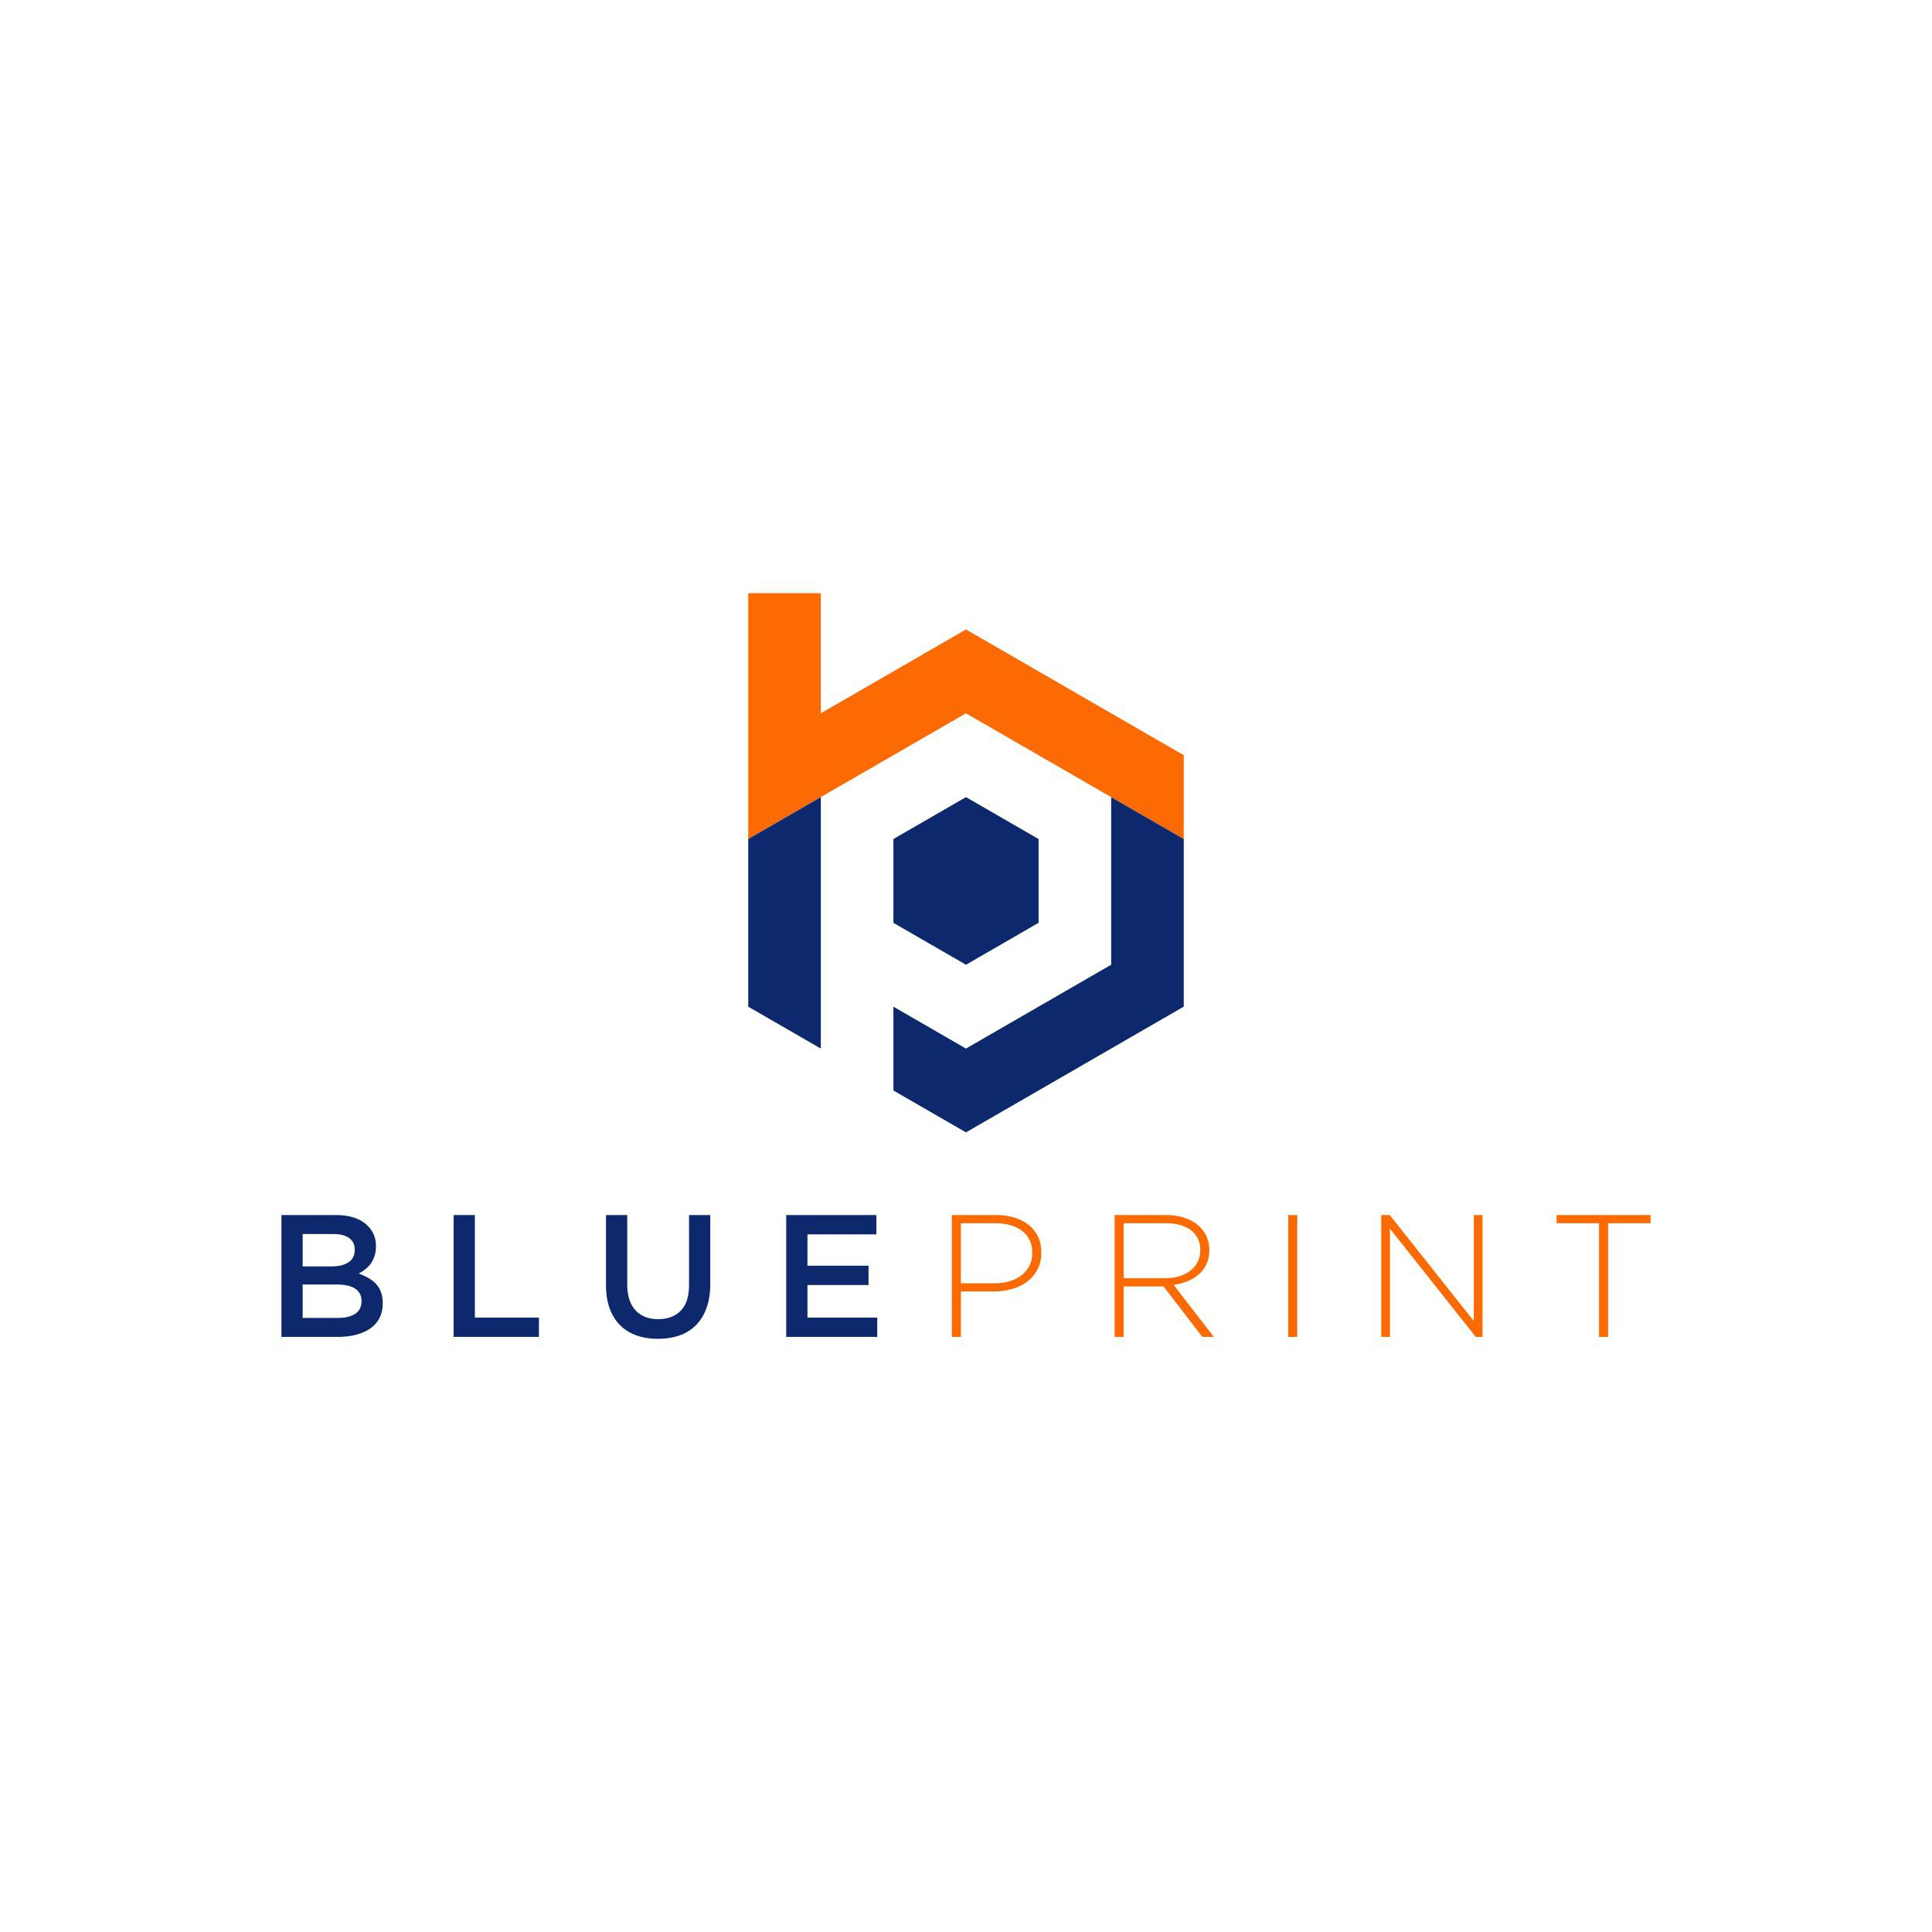 Design your blueprint for Blueprint